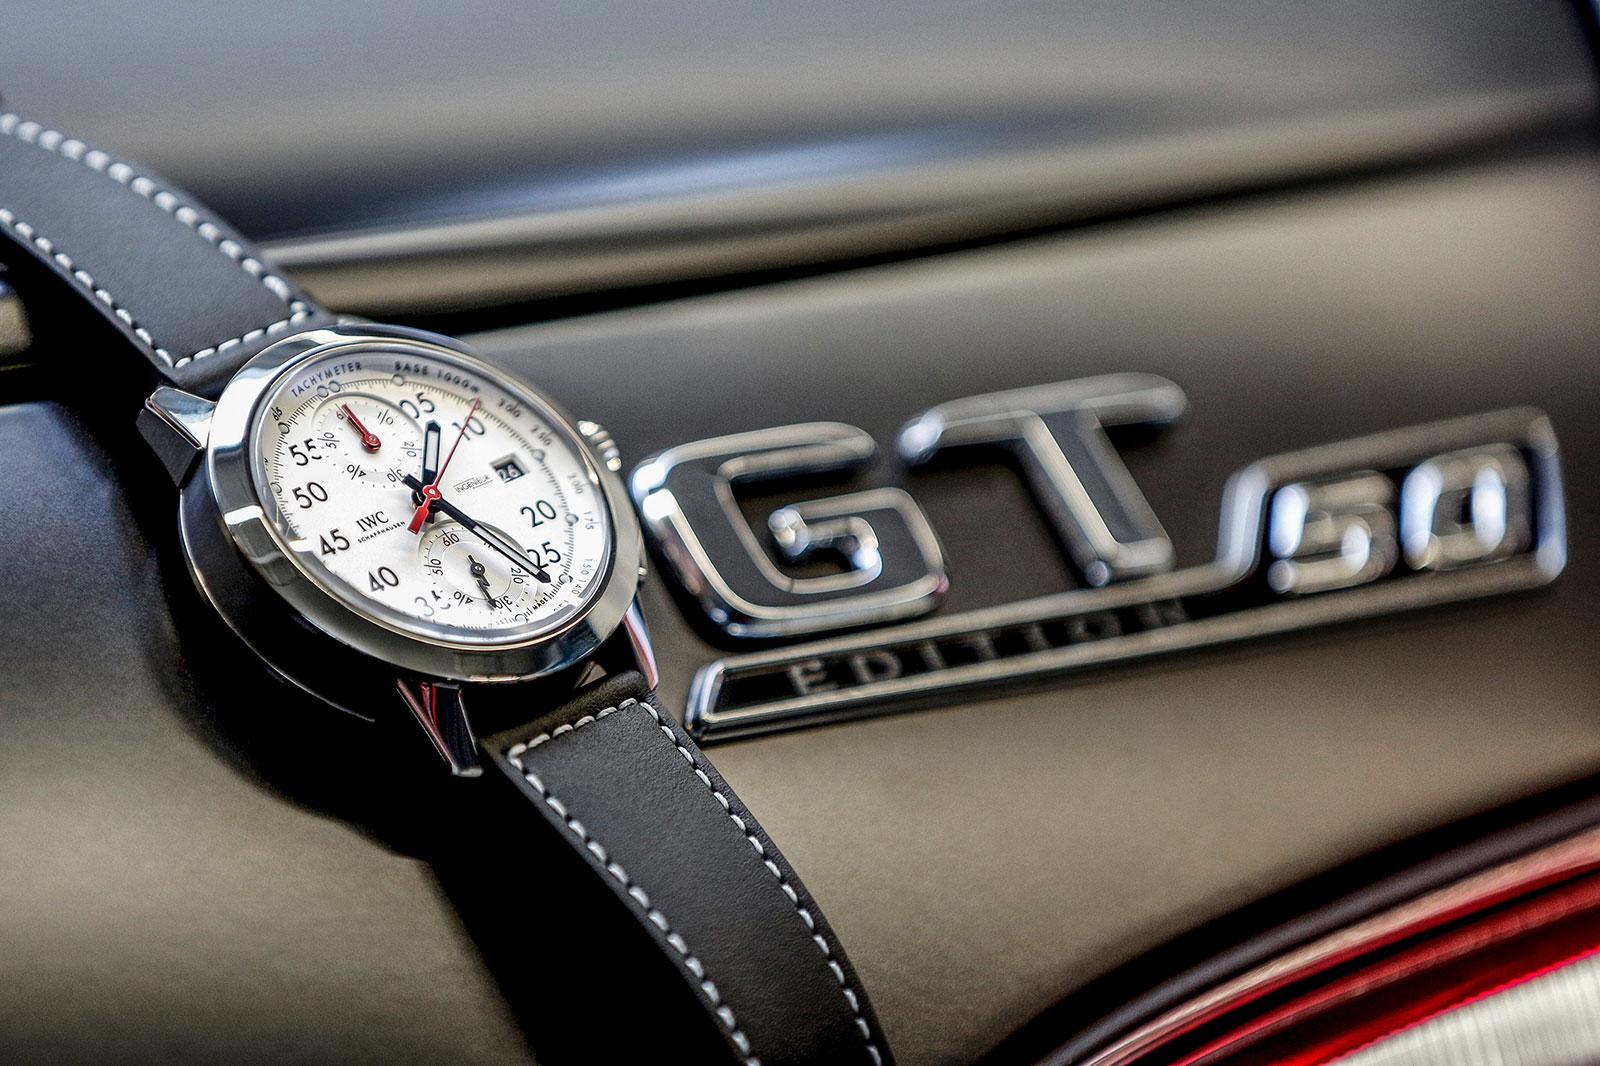 IWC Ingenieur Chronograph 50th Anniversary Mercedes-AMG 4